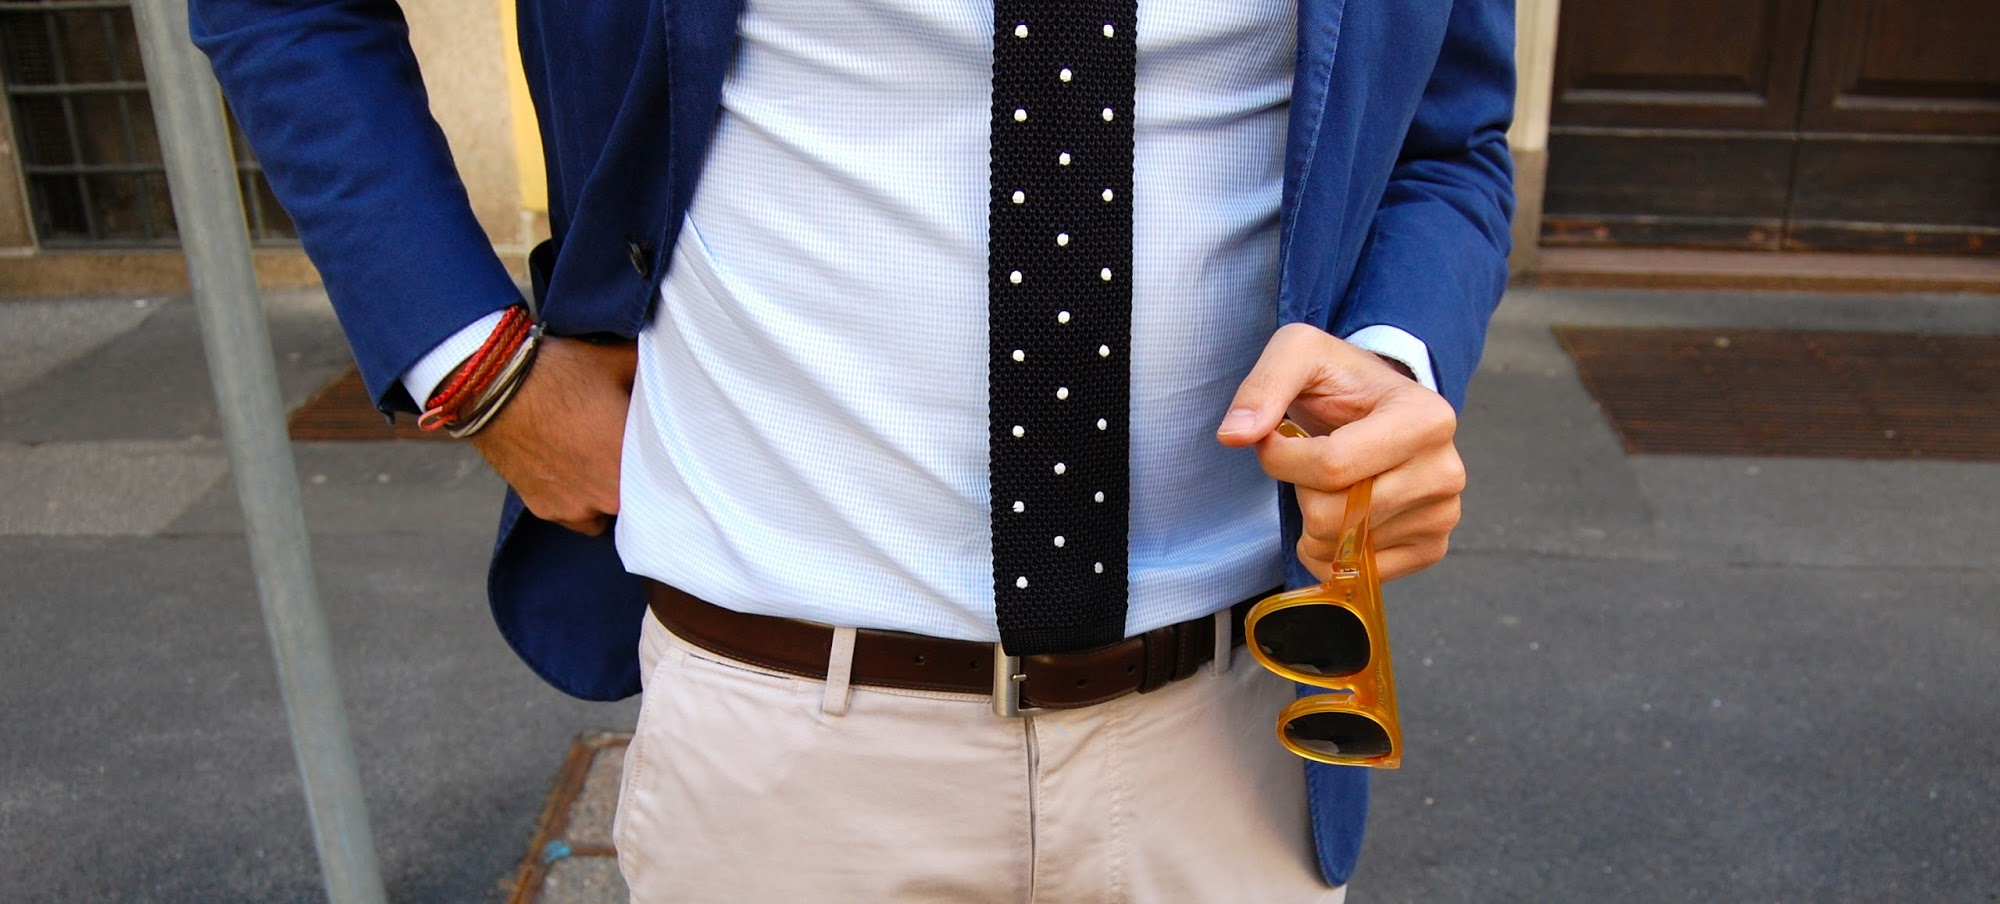 Still here: Boglioli Jacket & Polka Dot Knit Tie